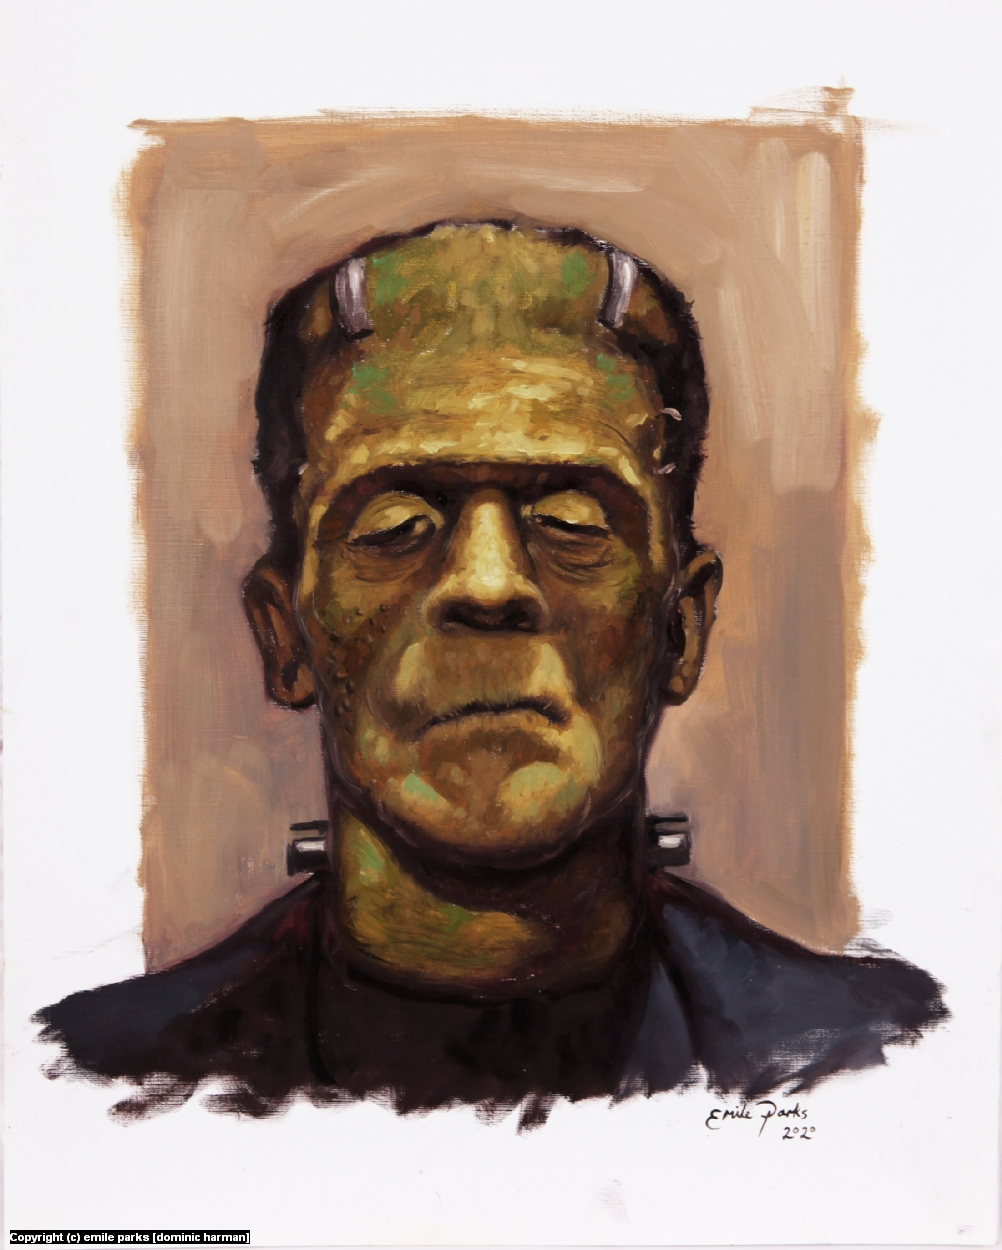 Frankenstein's Monster Artwork by emile parks